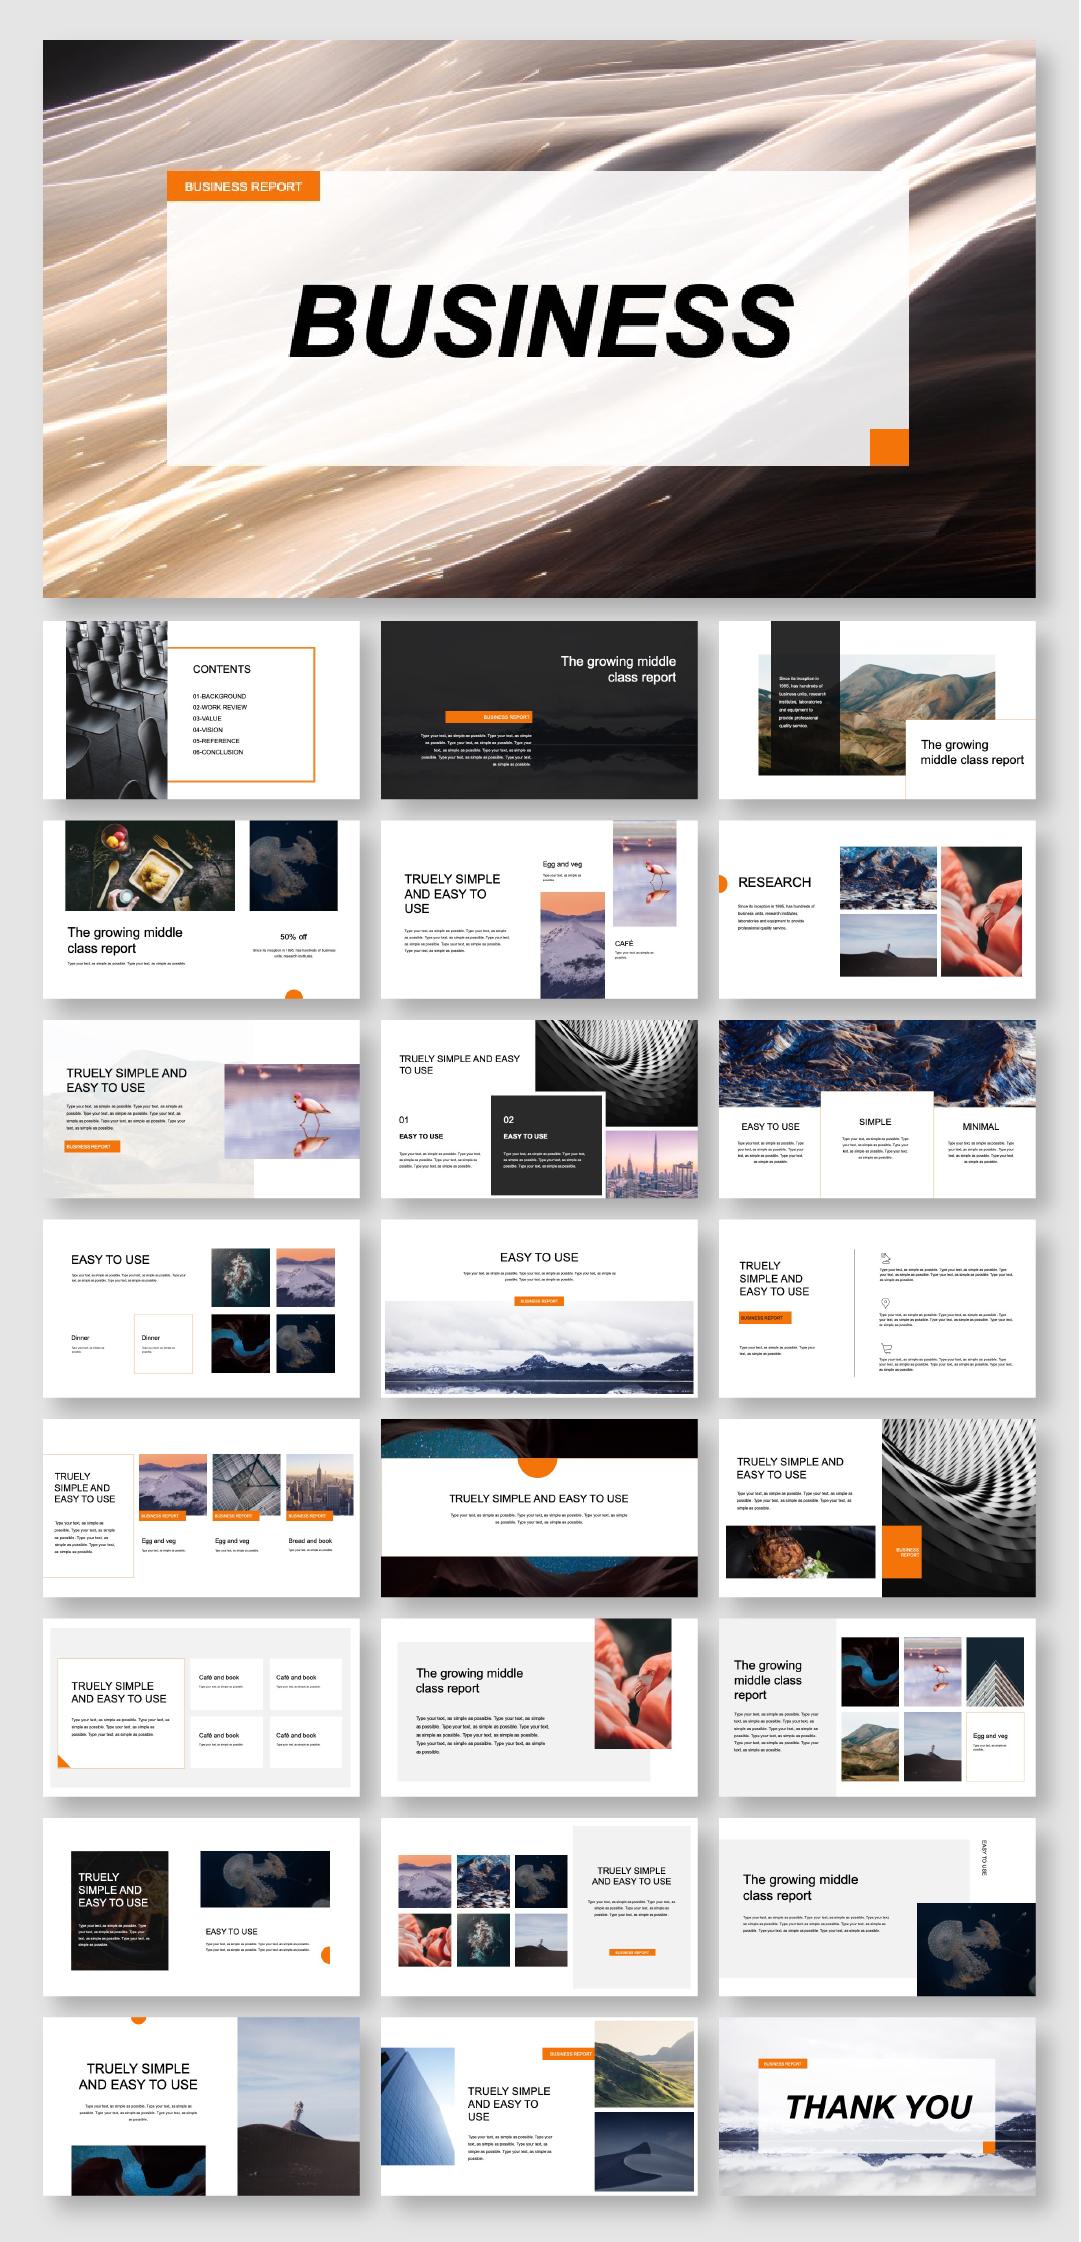 Resume Template Power Point Template Web Design Instagram Ideas Layout Ideas Presentation Templates Powerpoint Design Templates Business Presentation Templates